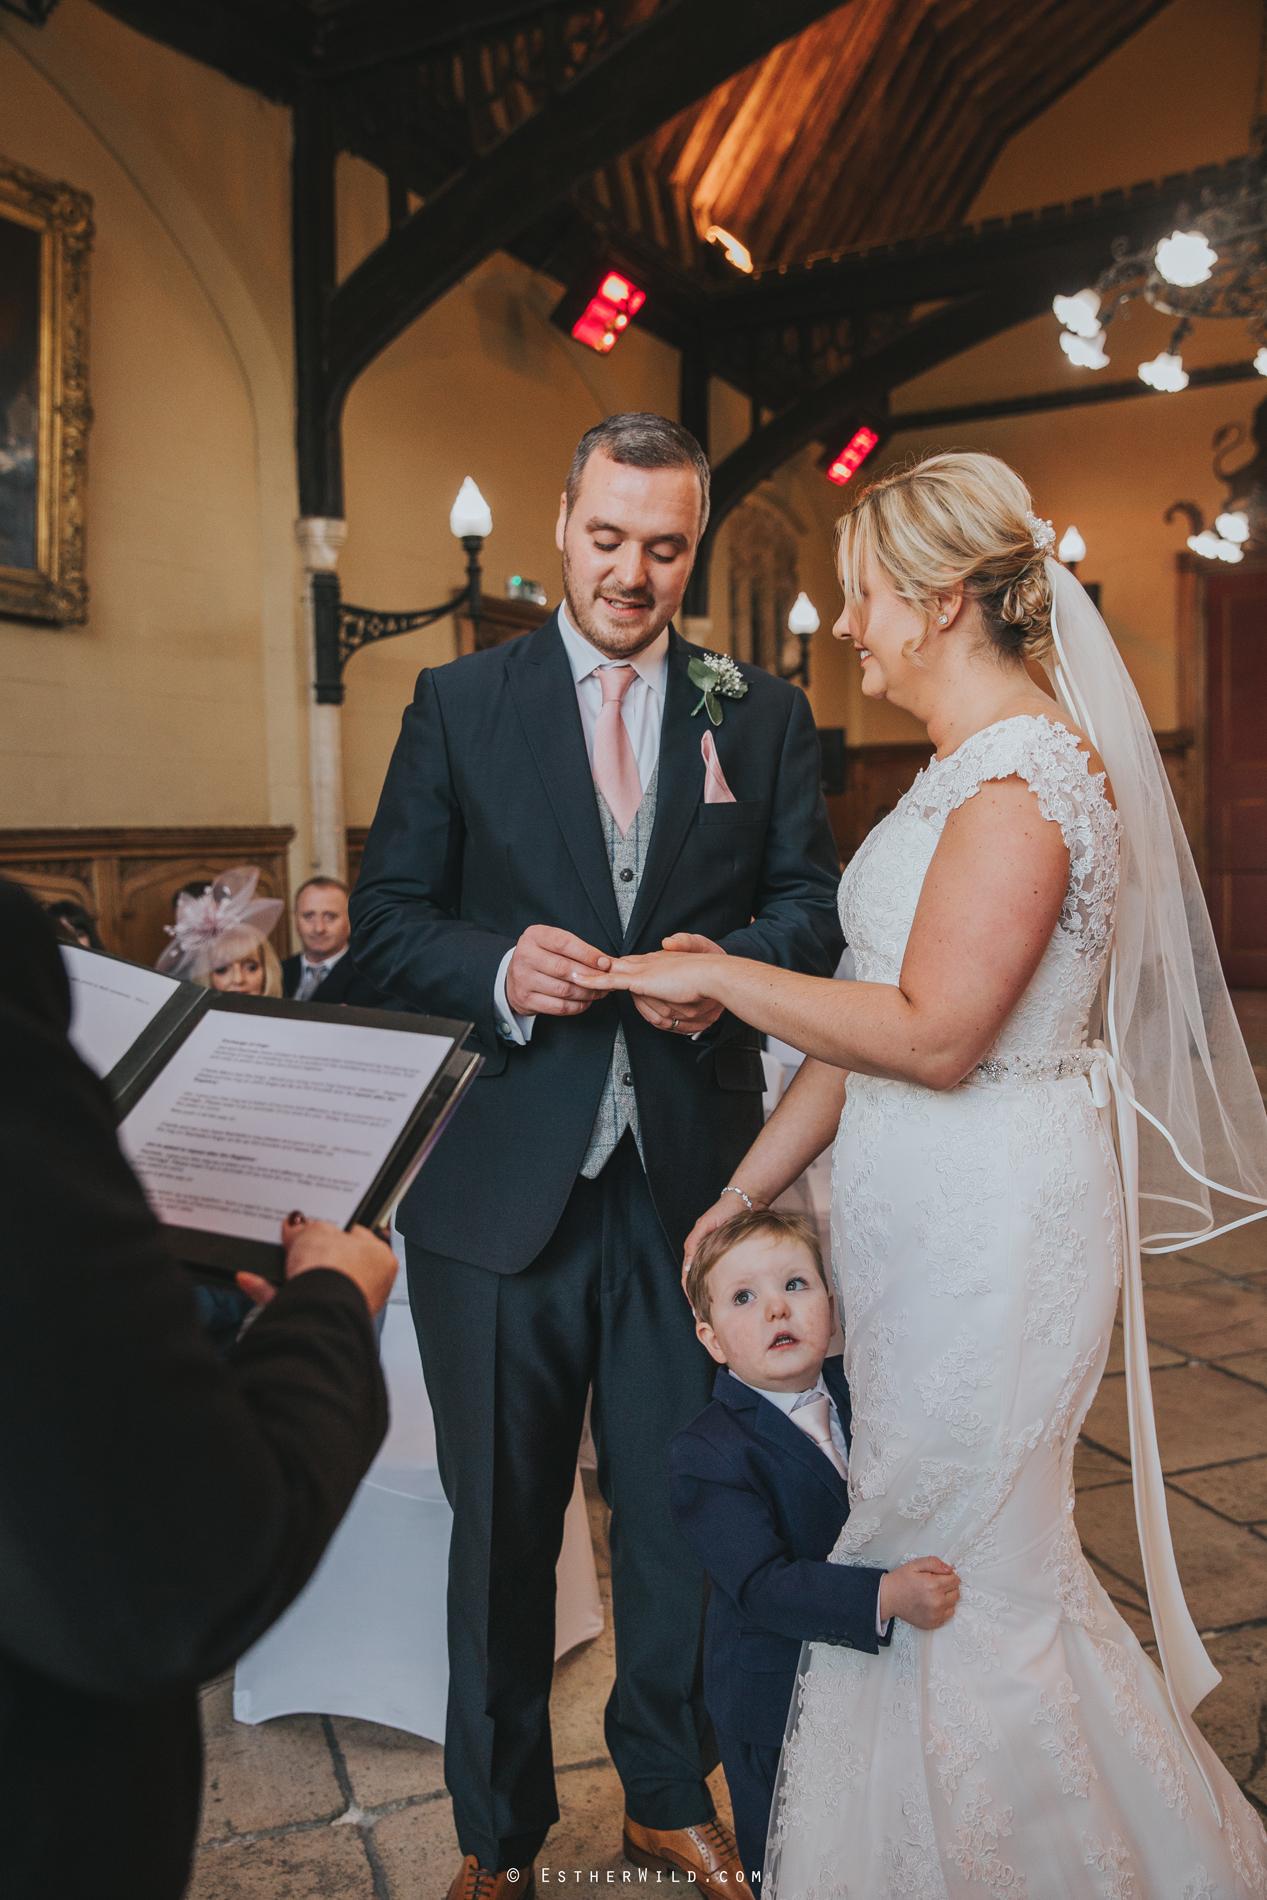 Wedding_Kings_Lynn_Town_Hall_Norfolk_Photographer_Esther_Wild_IMG_1021.jpg